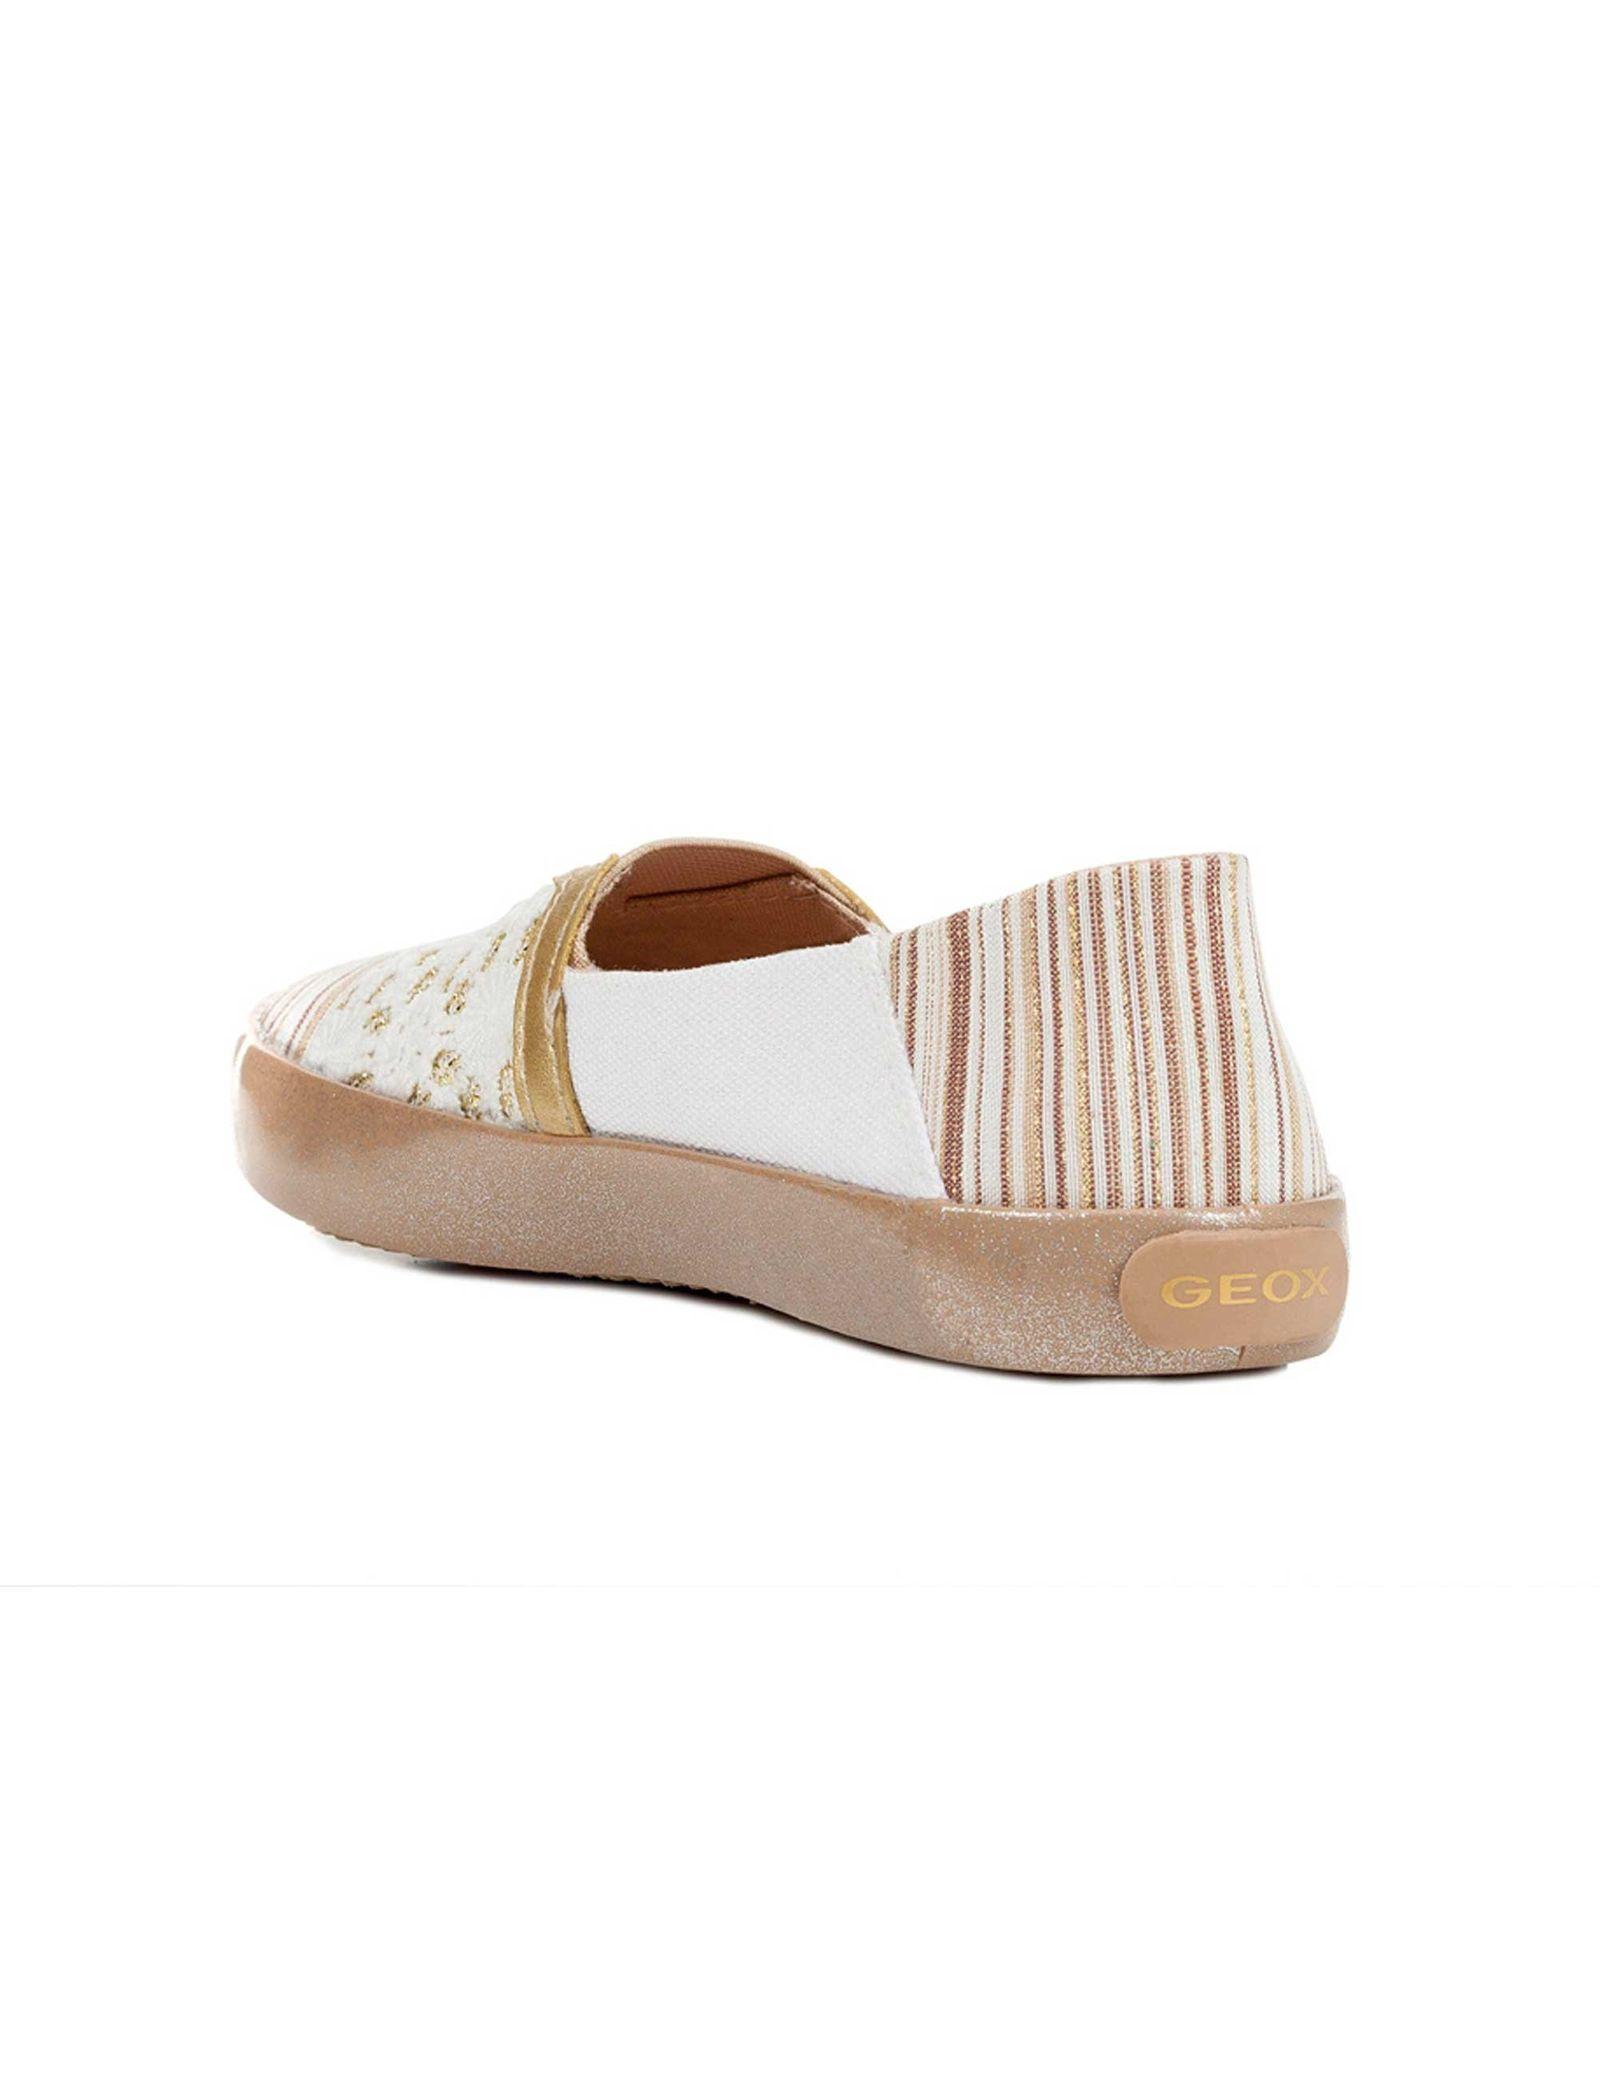 کفش تخت دخترانه JR KILWI - جی اوکس - طلايي - 3